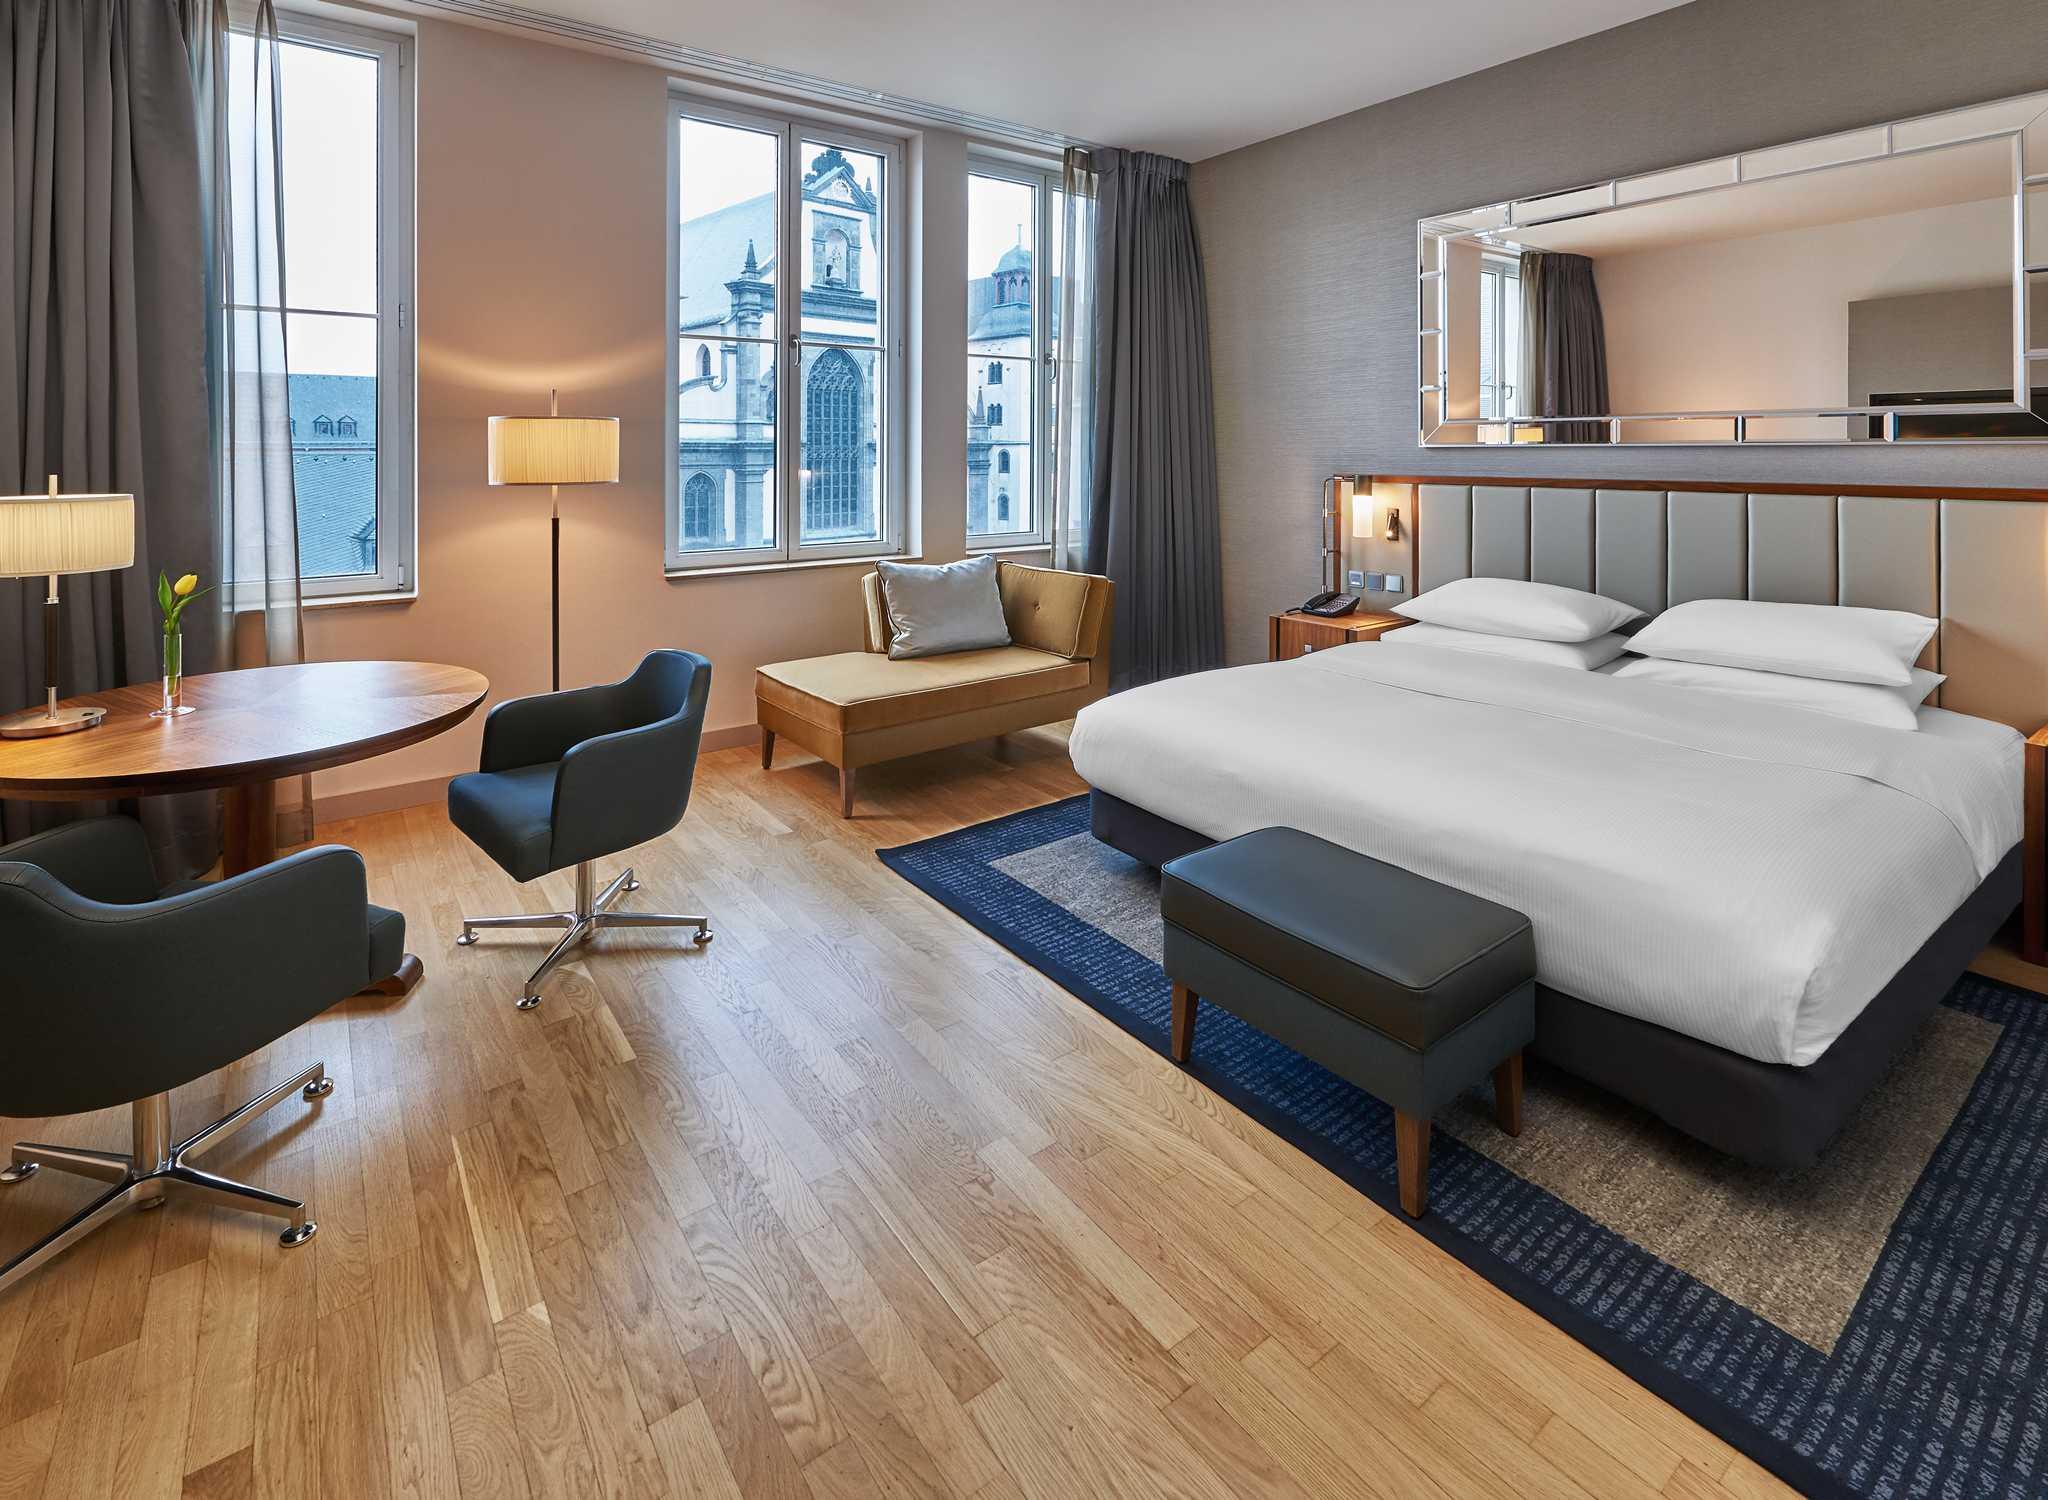 Hilton Cologne Hotels In Der Innenstadt Am K 246 Lner Dom